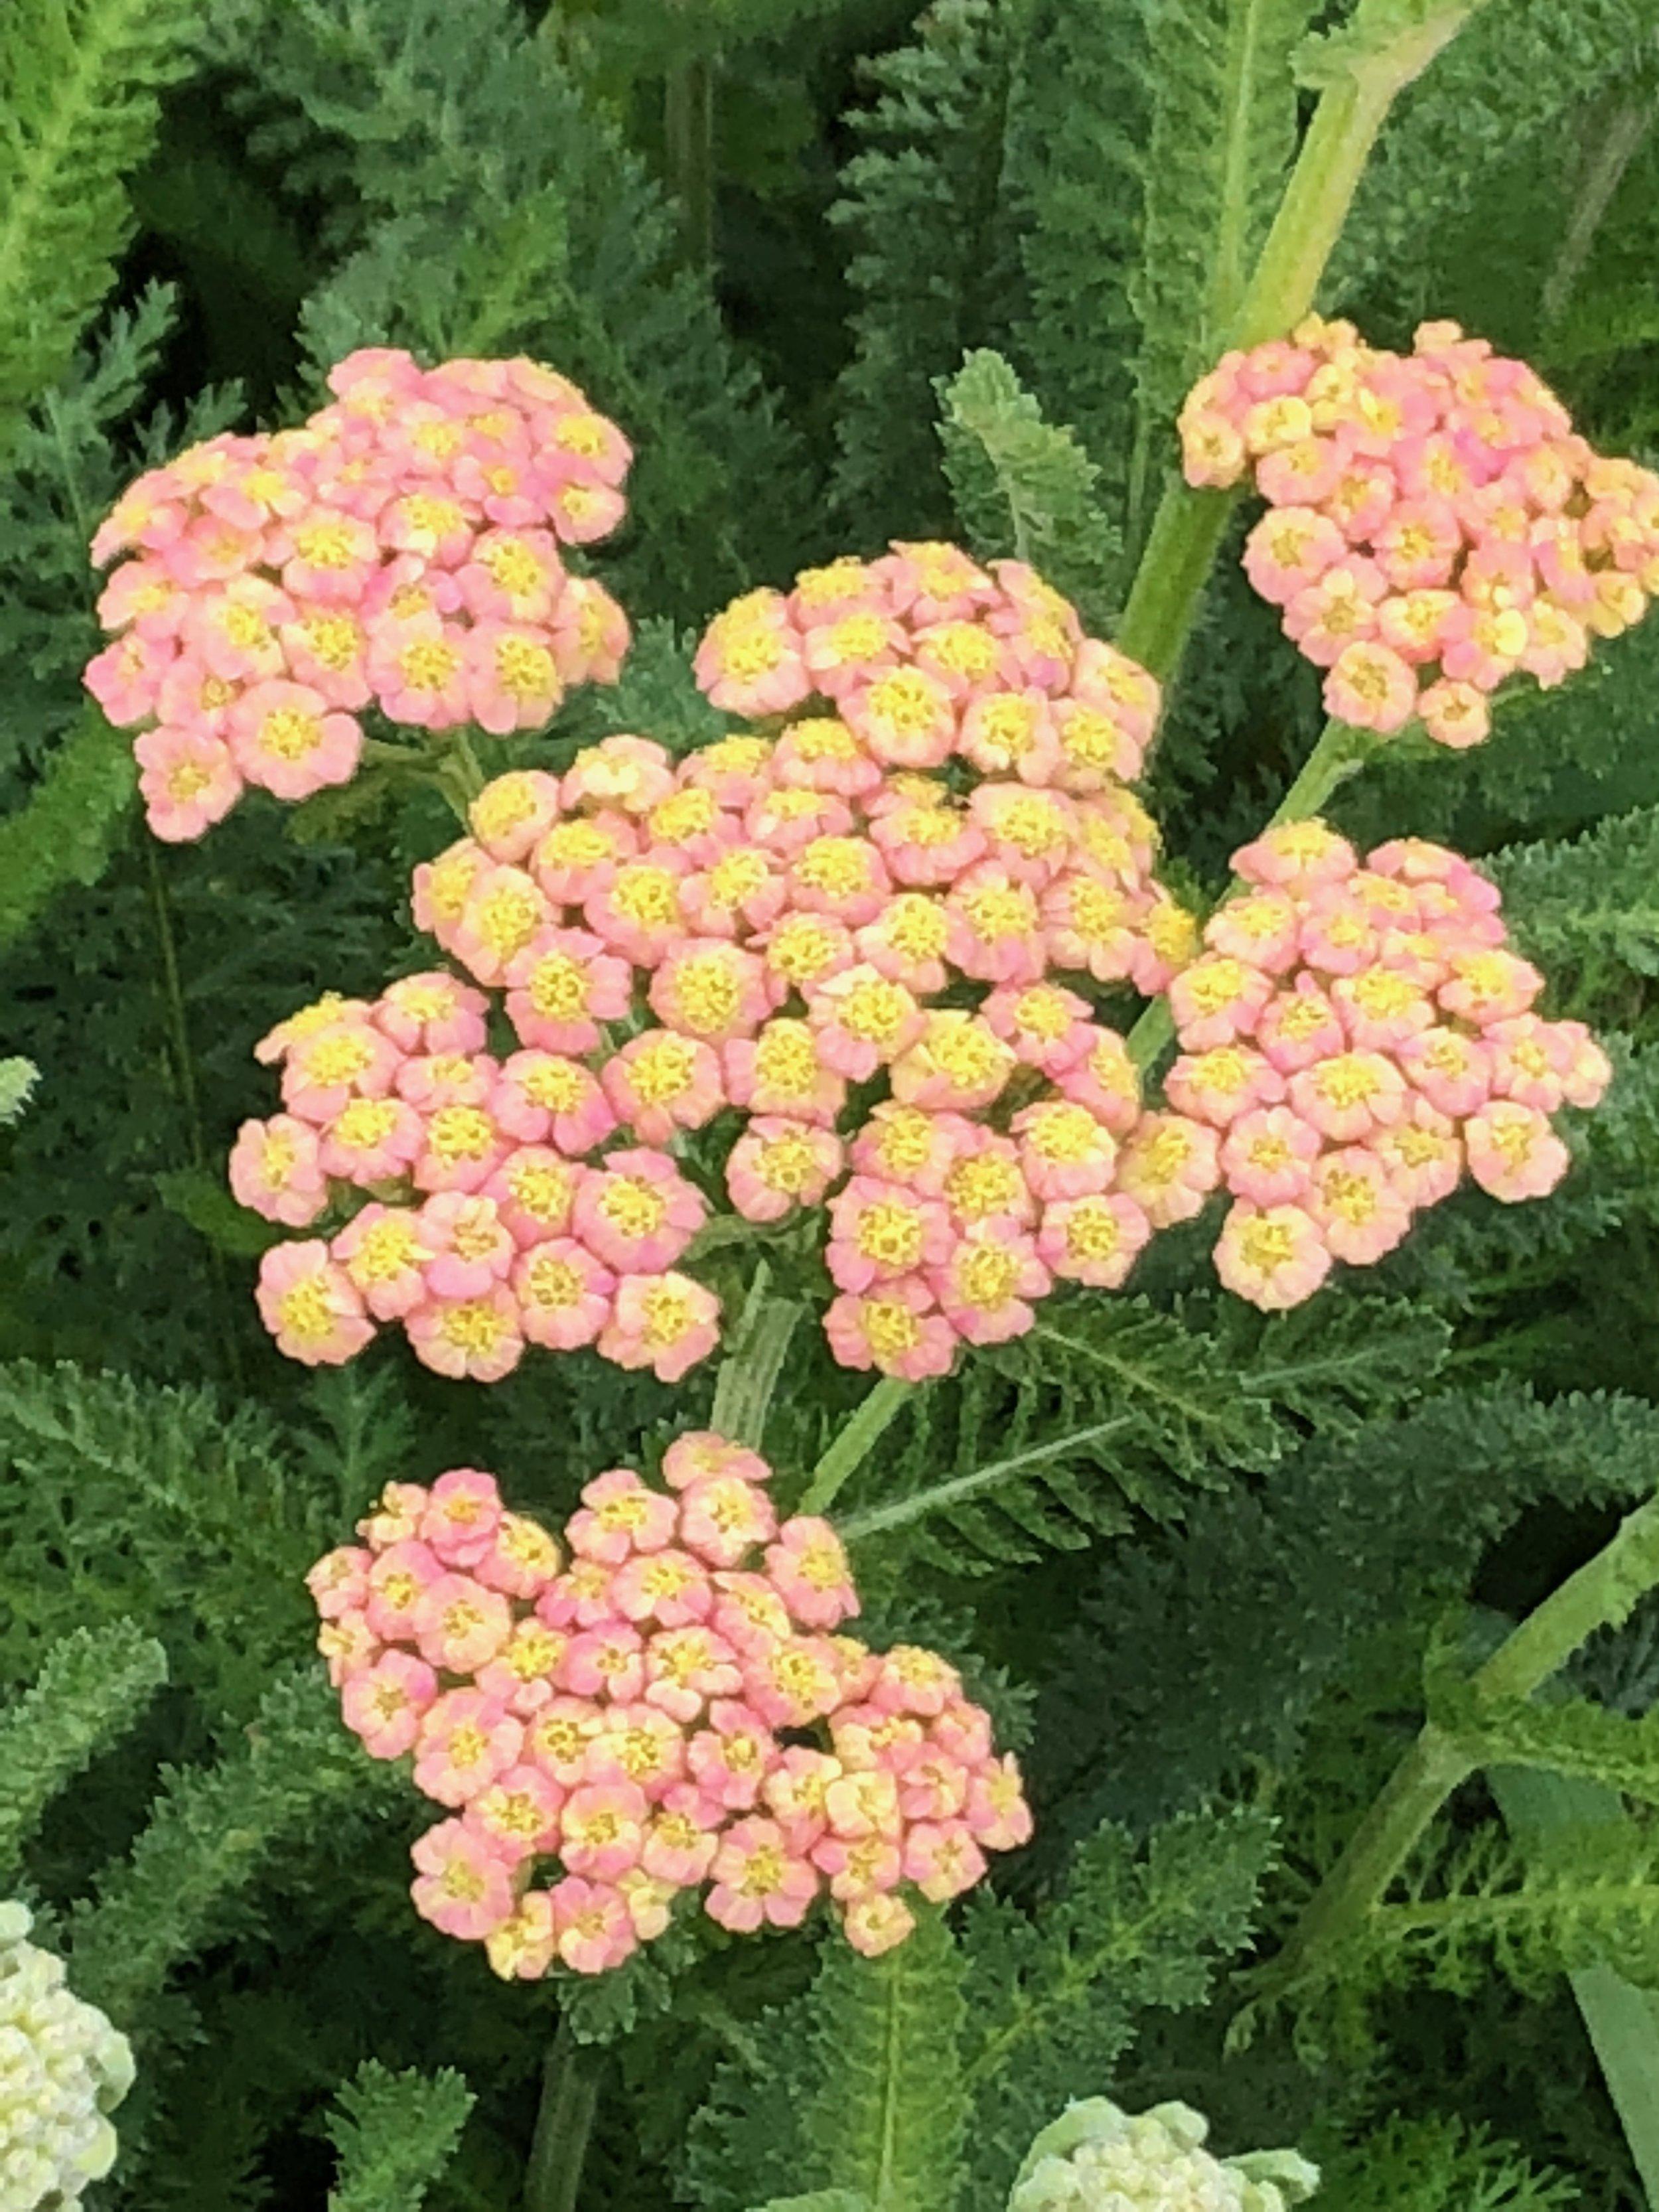 August: Amaranth, Celosia, Chocolate Lace Flower, Globe Amaranth, Queen Ann's Lace, Rudbeckia, Sunflowers, Yarrow, Zinnias, Scented Geraniums -